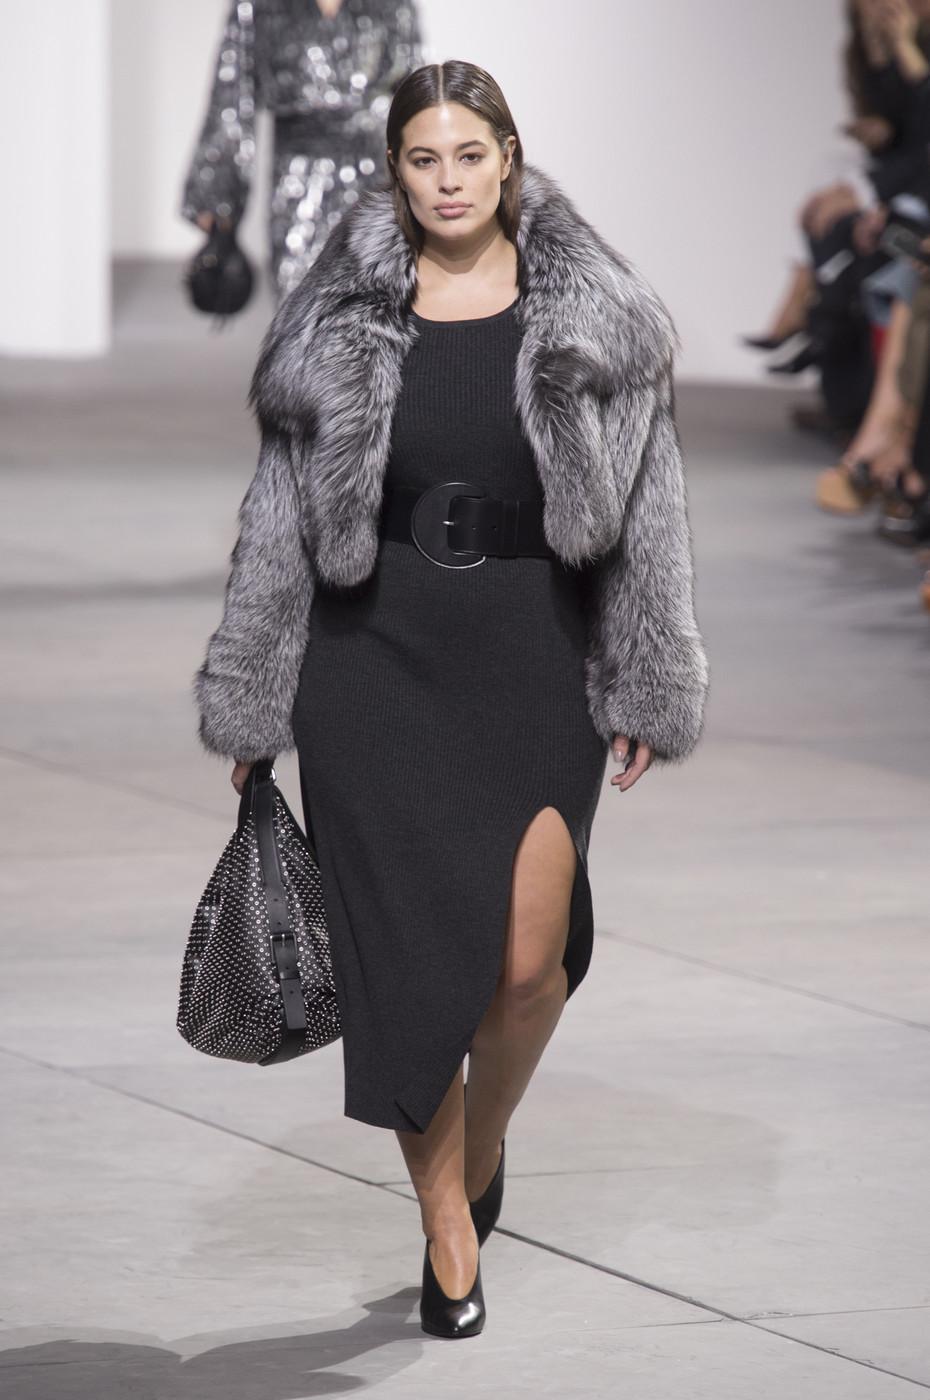 New York Fashion Week ne arata ca moda nu tine cont de varsta sau marimi